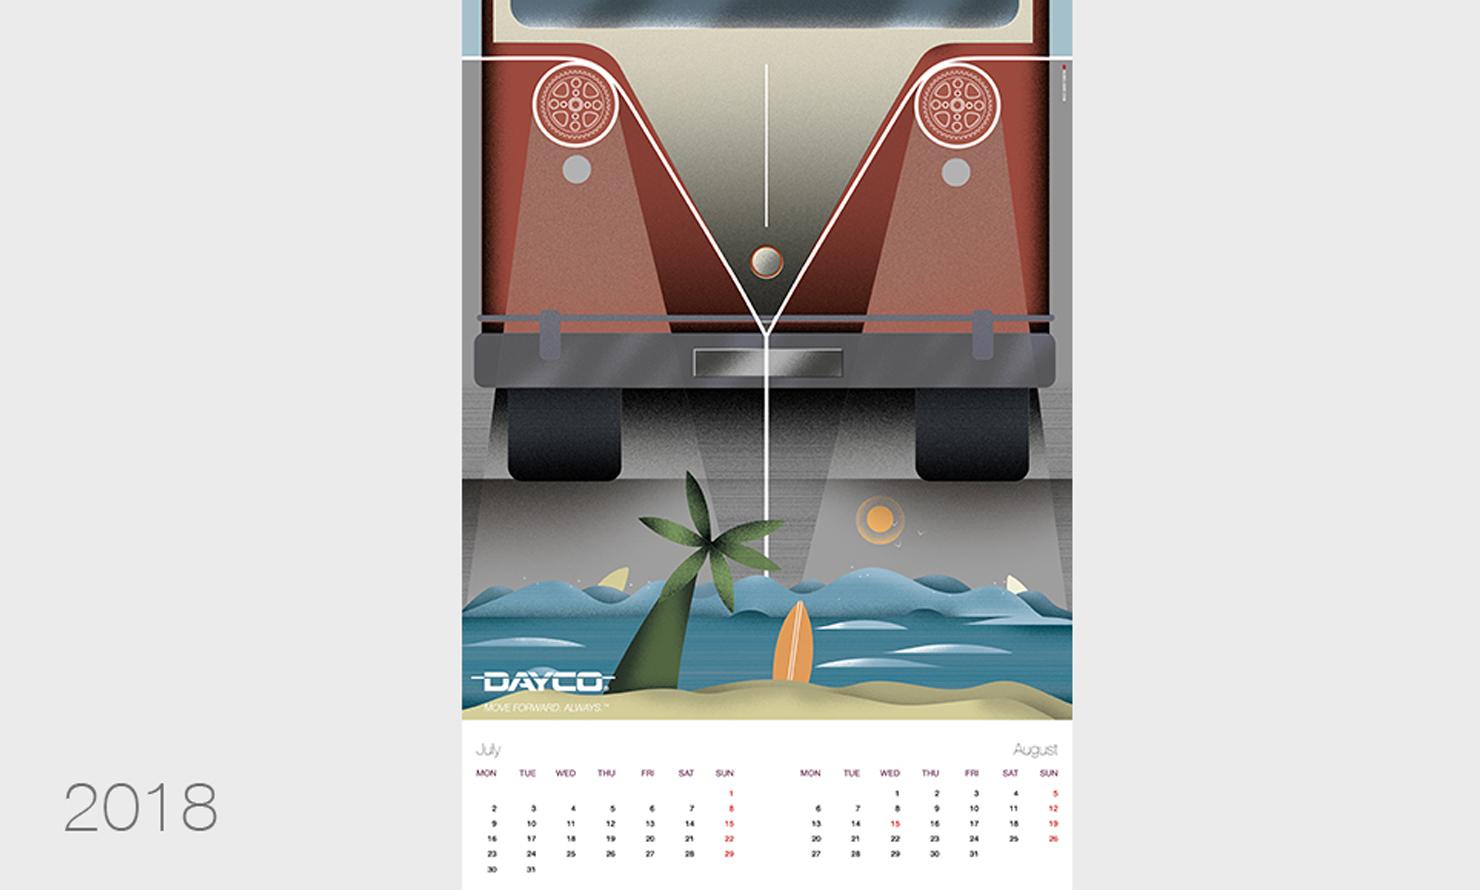 https://www.kubelibre.com/uploads/Slider-work-tutti-clienti/dayco-calendario-2018-4.jpg